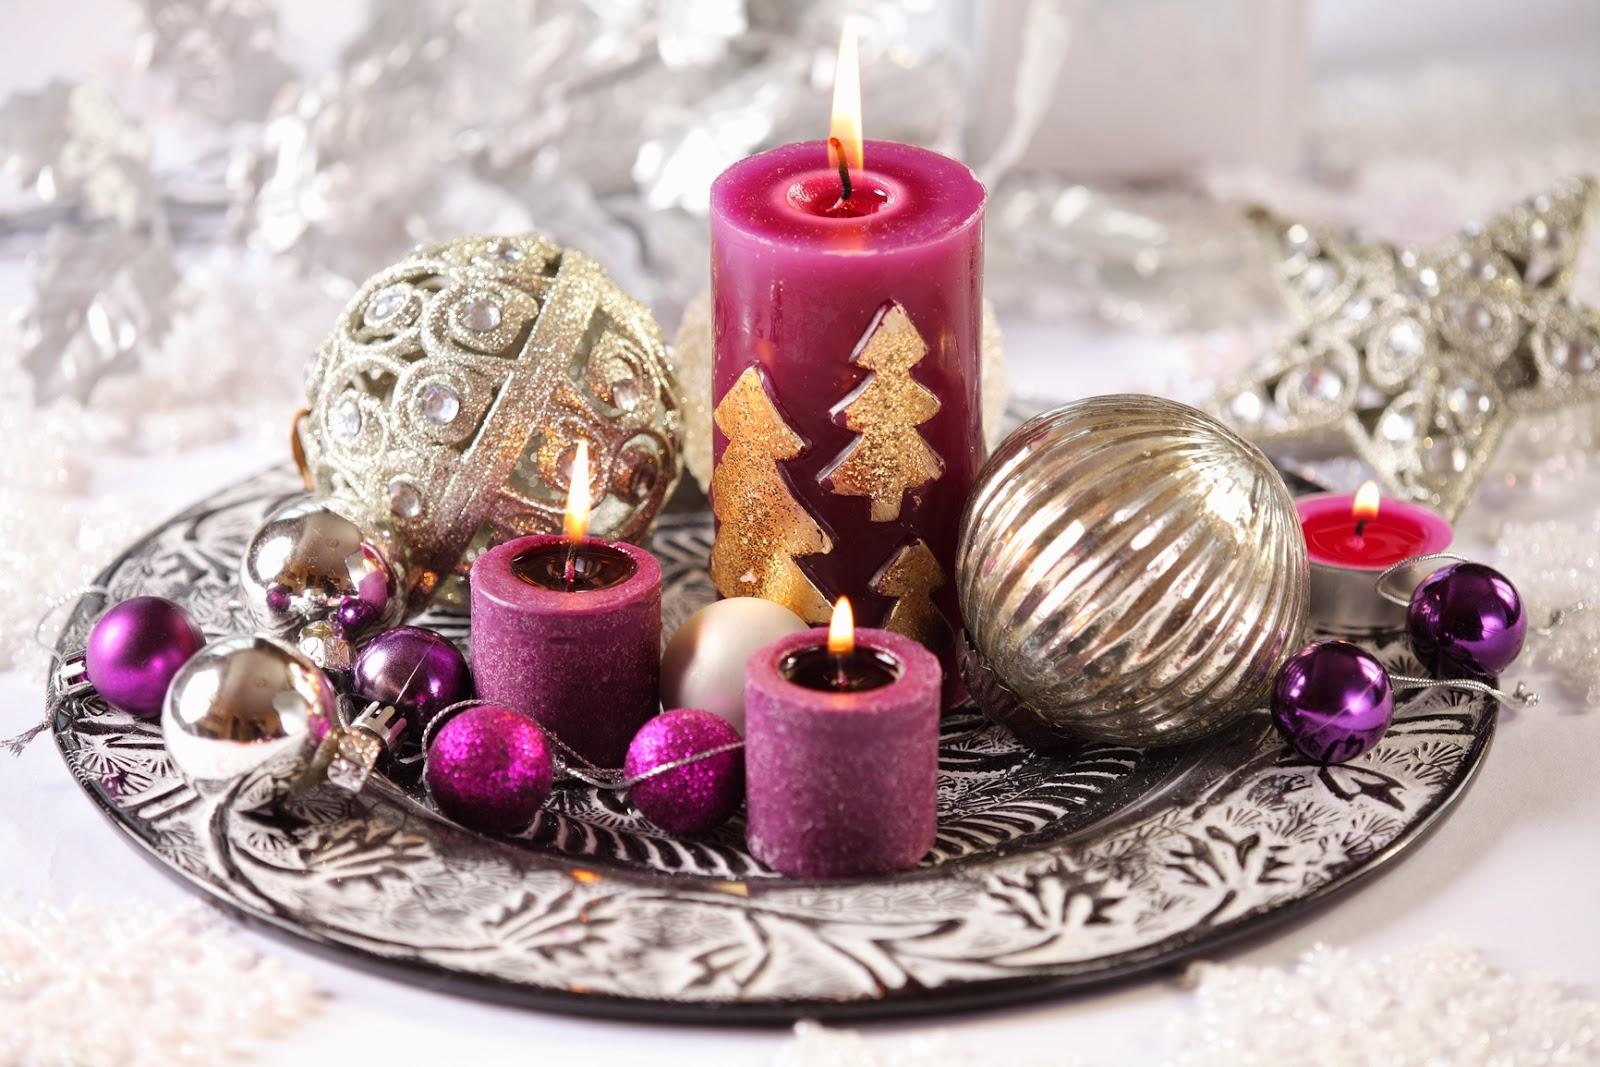 ♥★One day... PARADISE ★♥ - Página 39 Imagenes-para-Navidad-postales-navide%25C3%25B1as-+%25282%2529